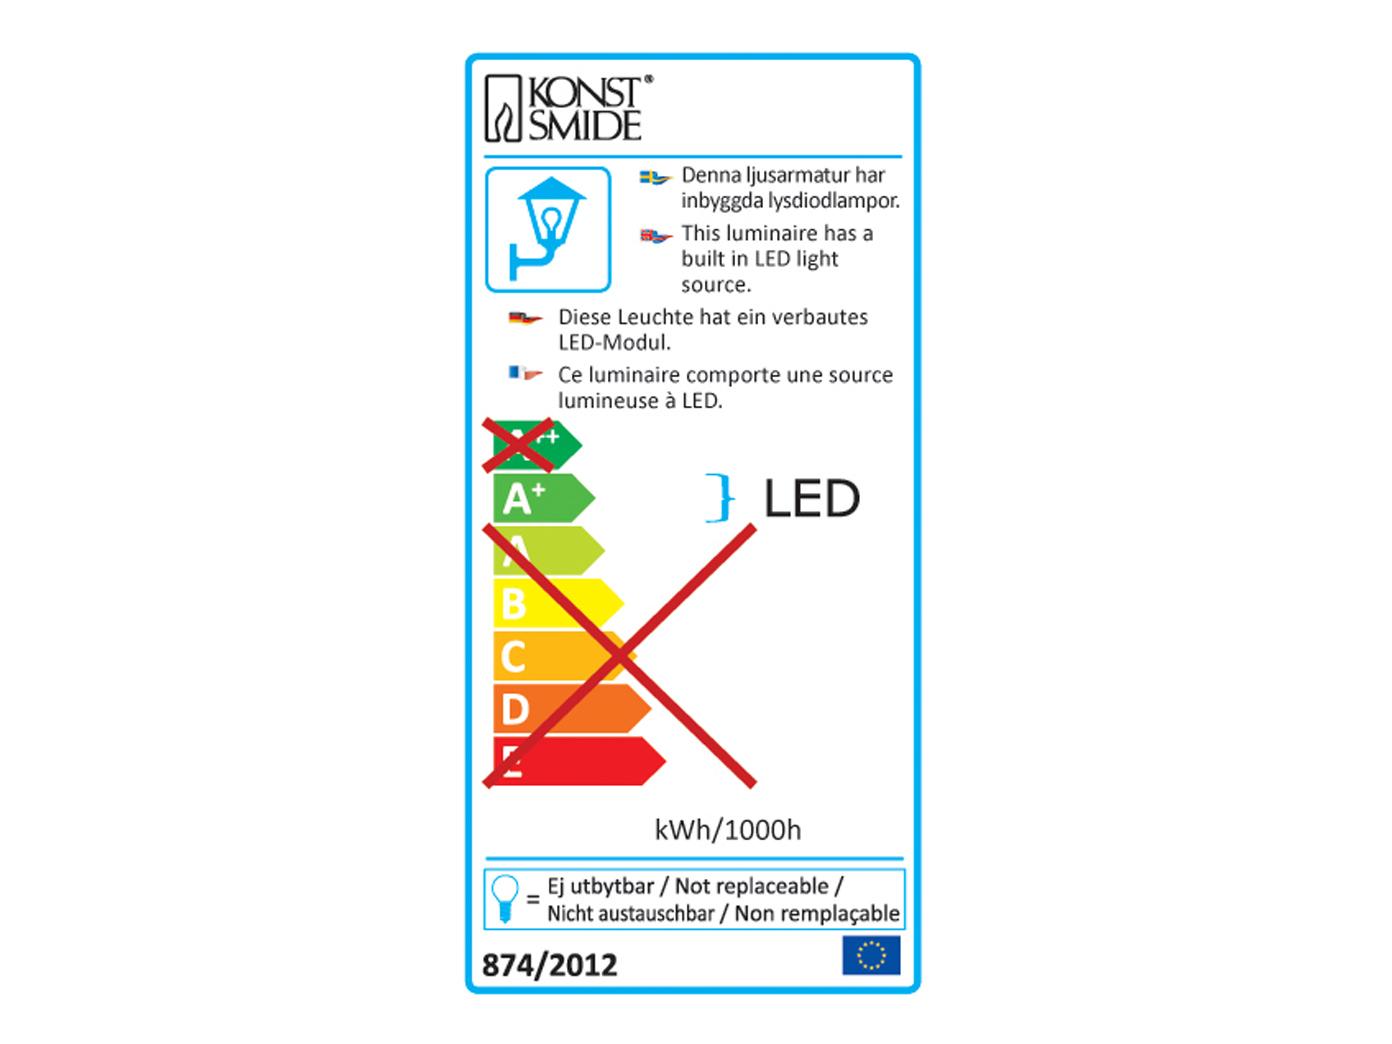 4er-LED Wandaufbauleuchte Wegeleuchte Wegeleuchte Wegeleuchte PRATO Bewegungsmelder batteriebetrieben f44dee